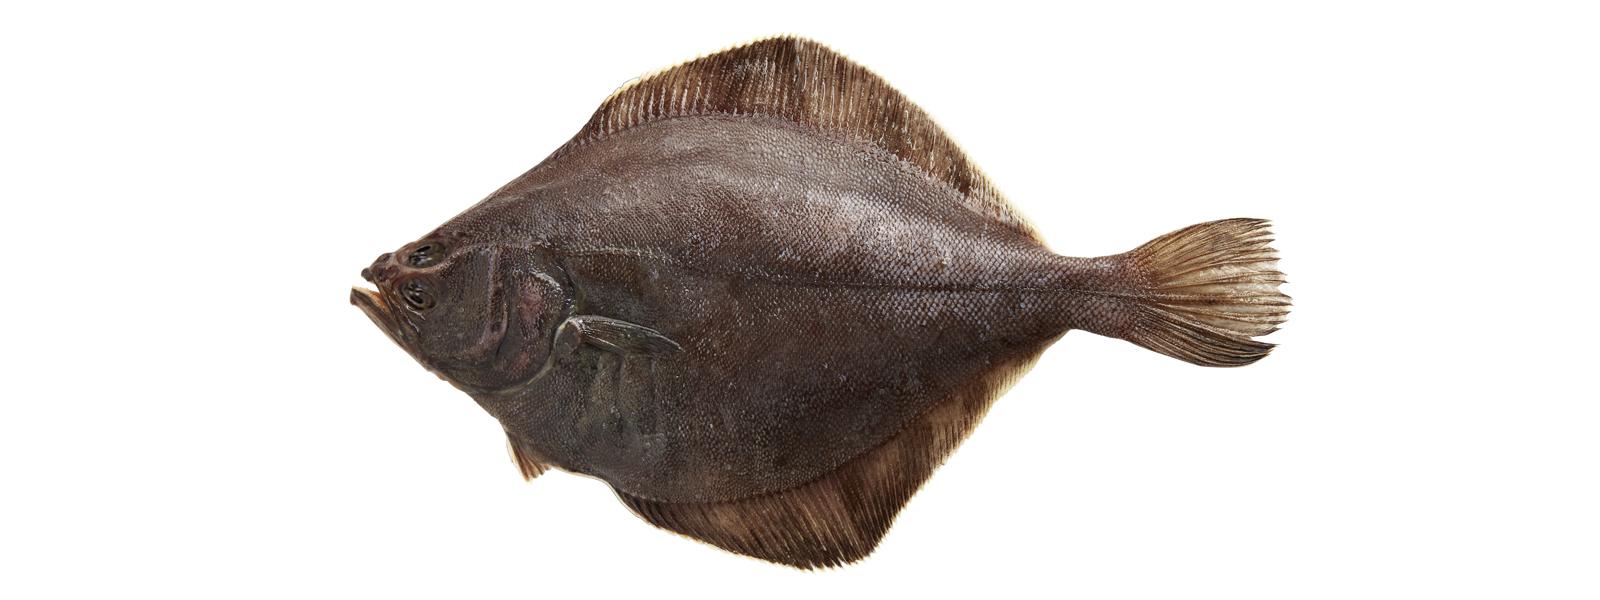 Alaska sole